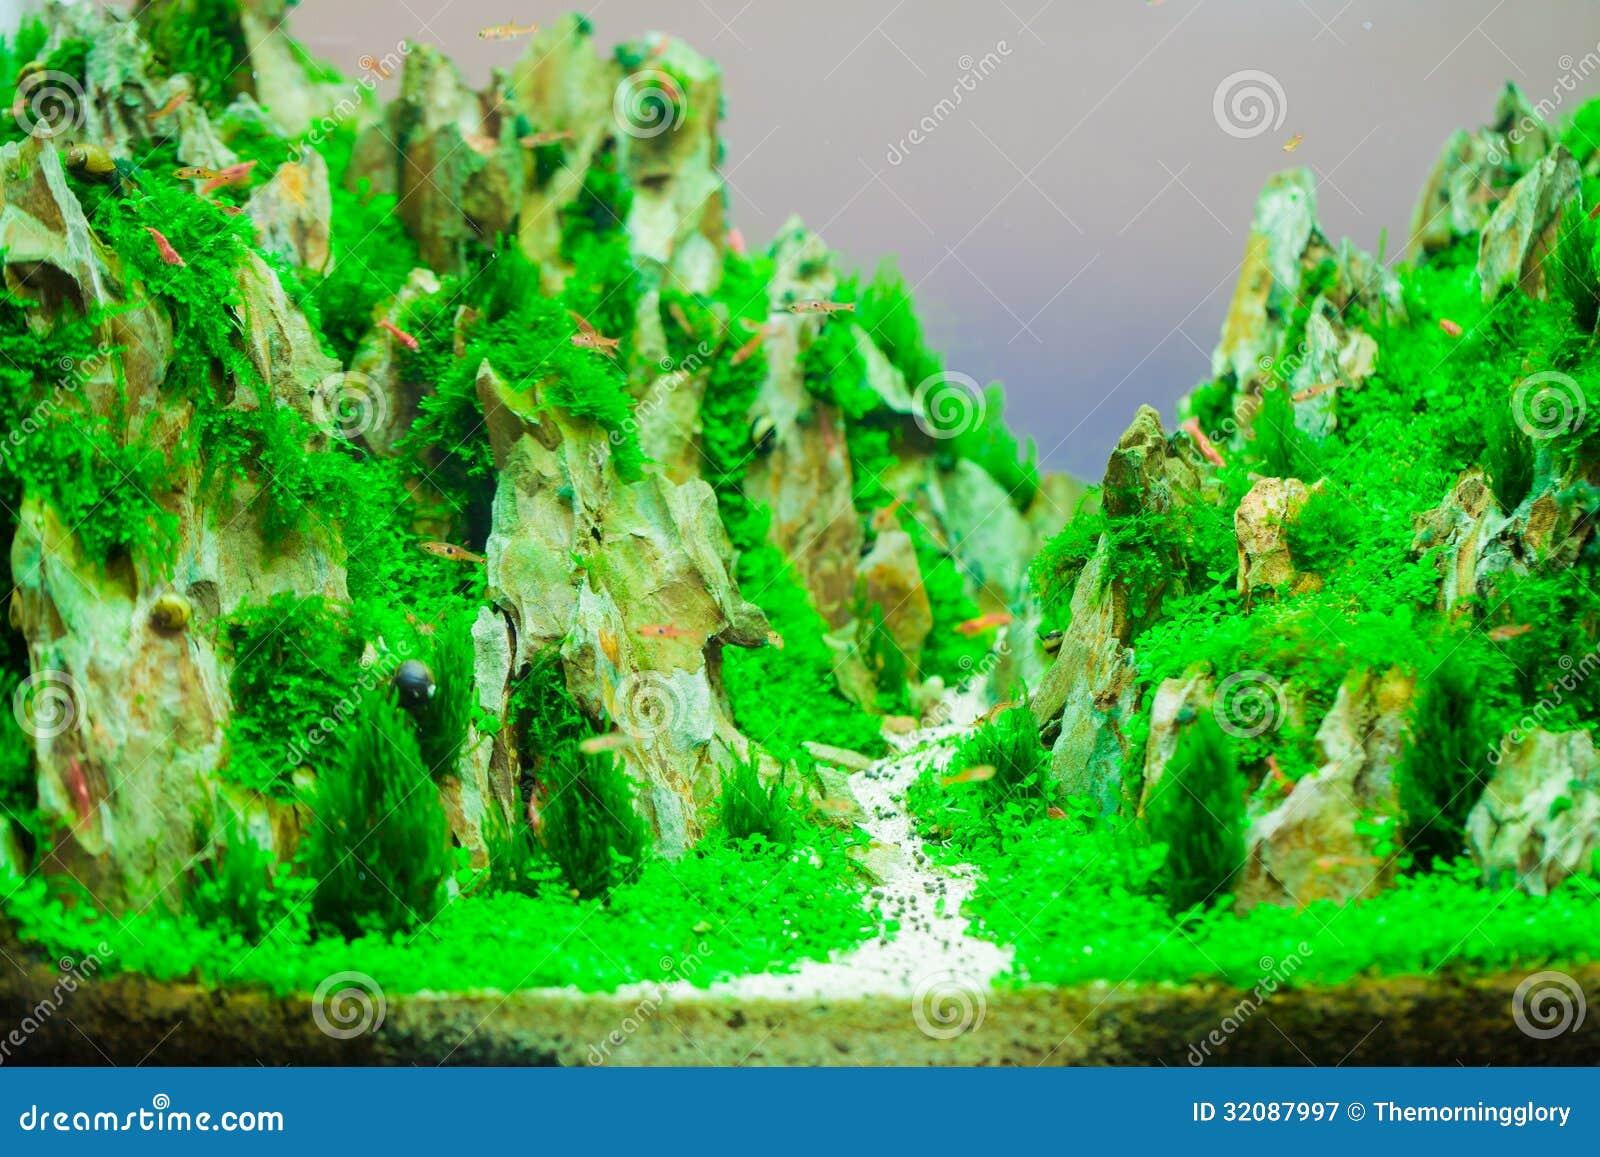 Background Of The Green Aquarium Seaweed Underwater Royalty Free Stock ...